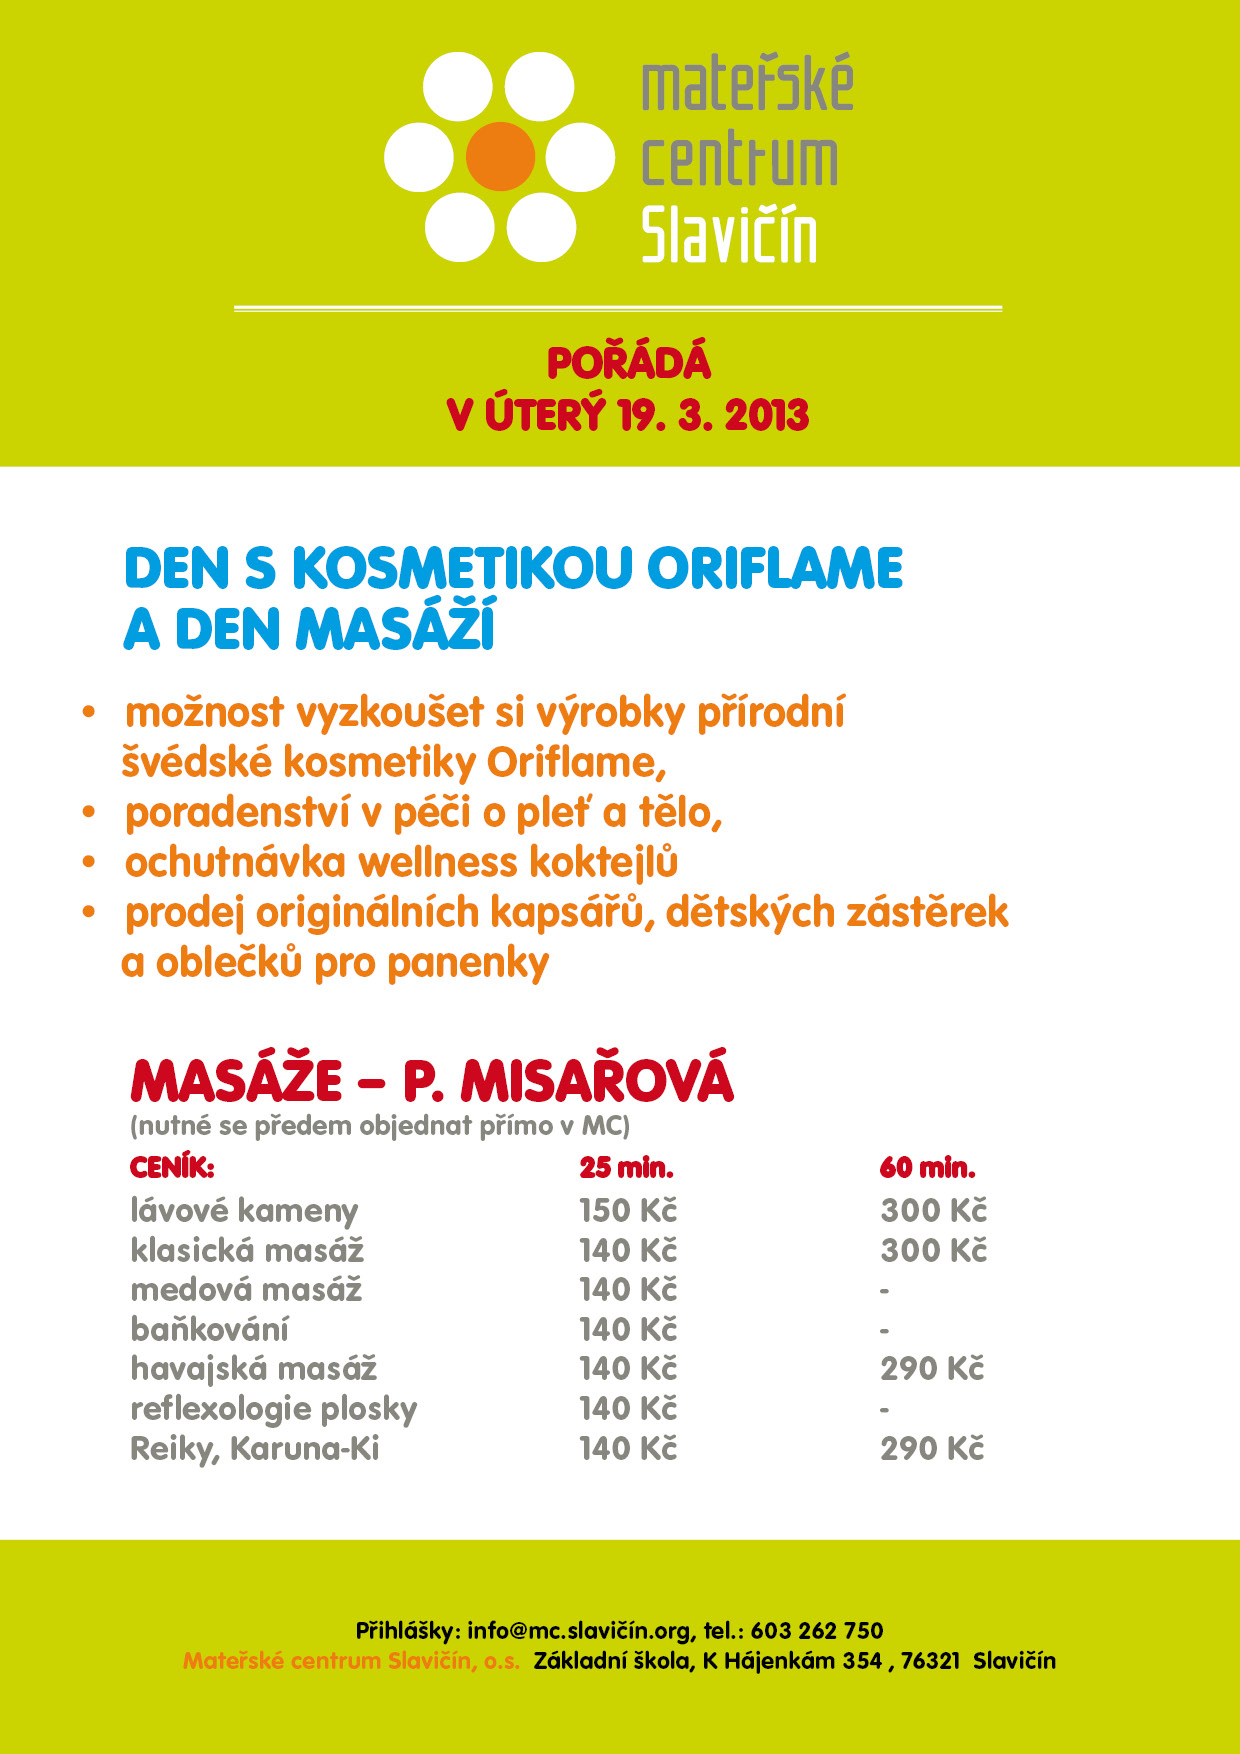 906236edb30 Mateřské centrum Slavičín